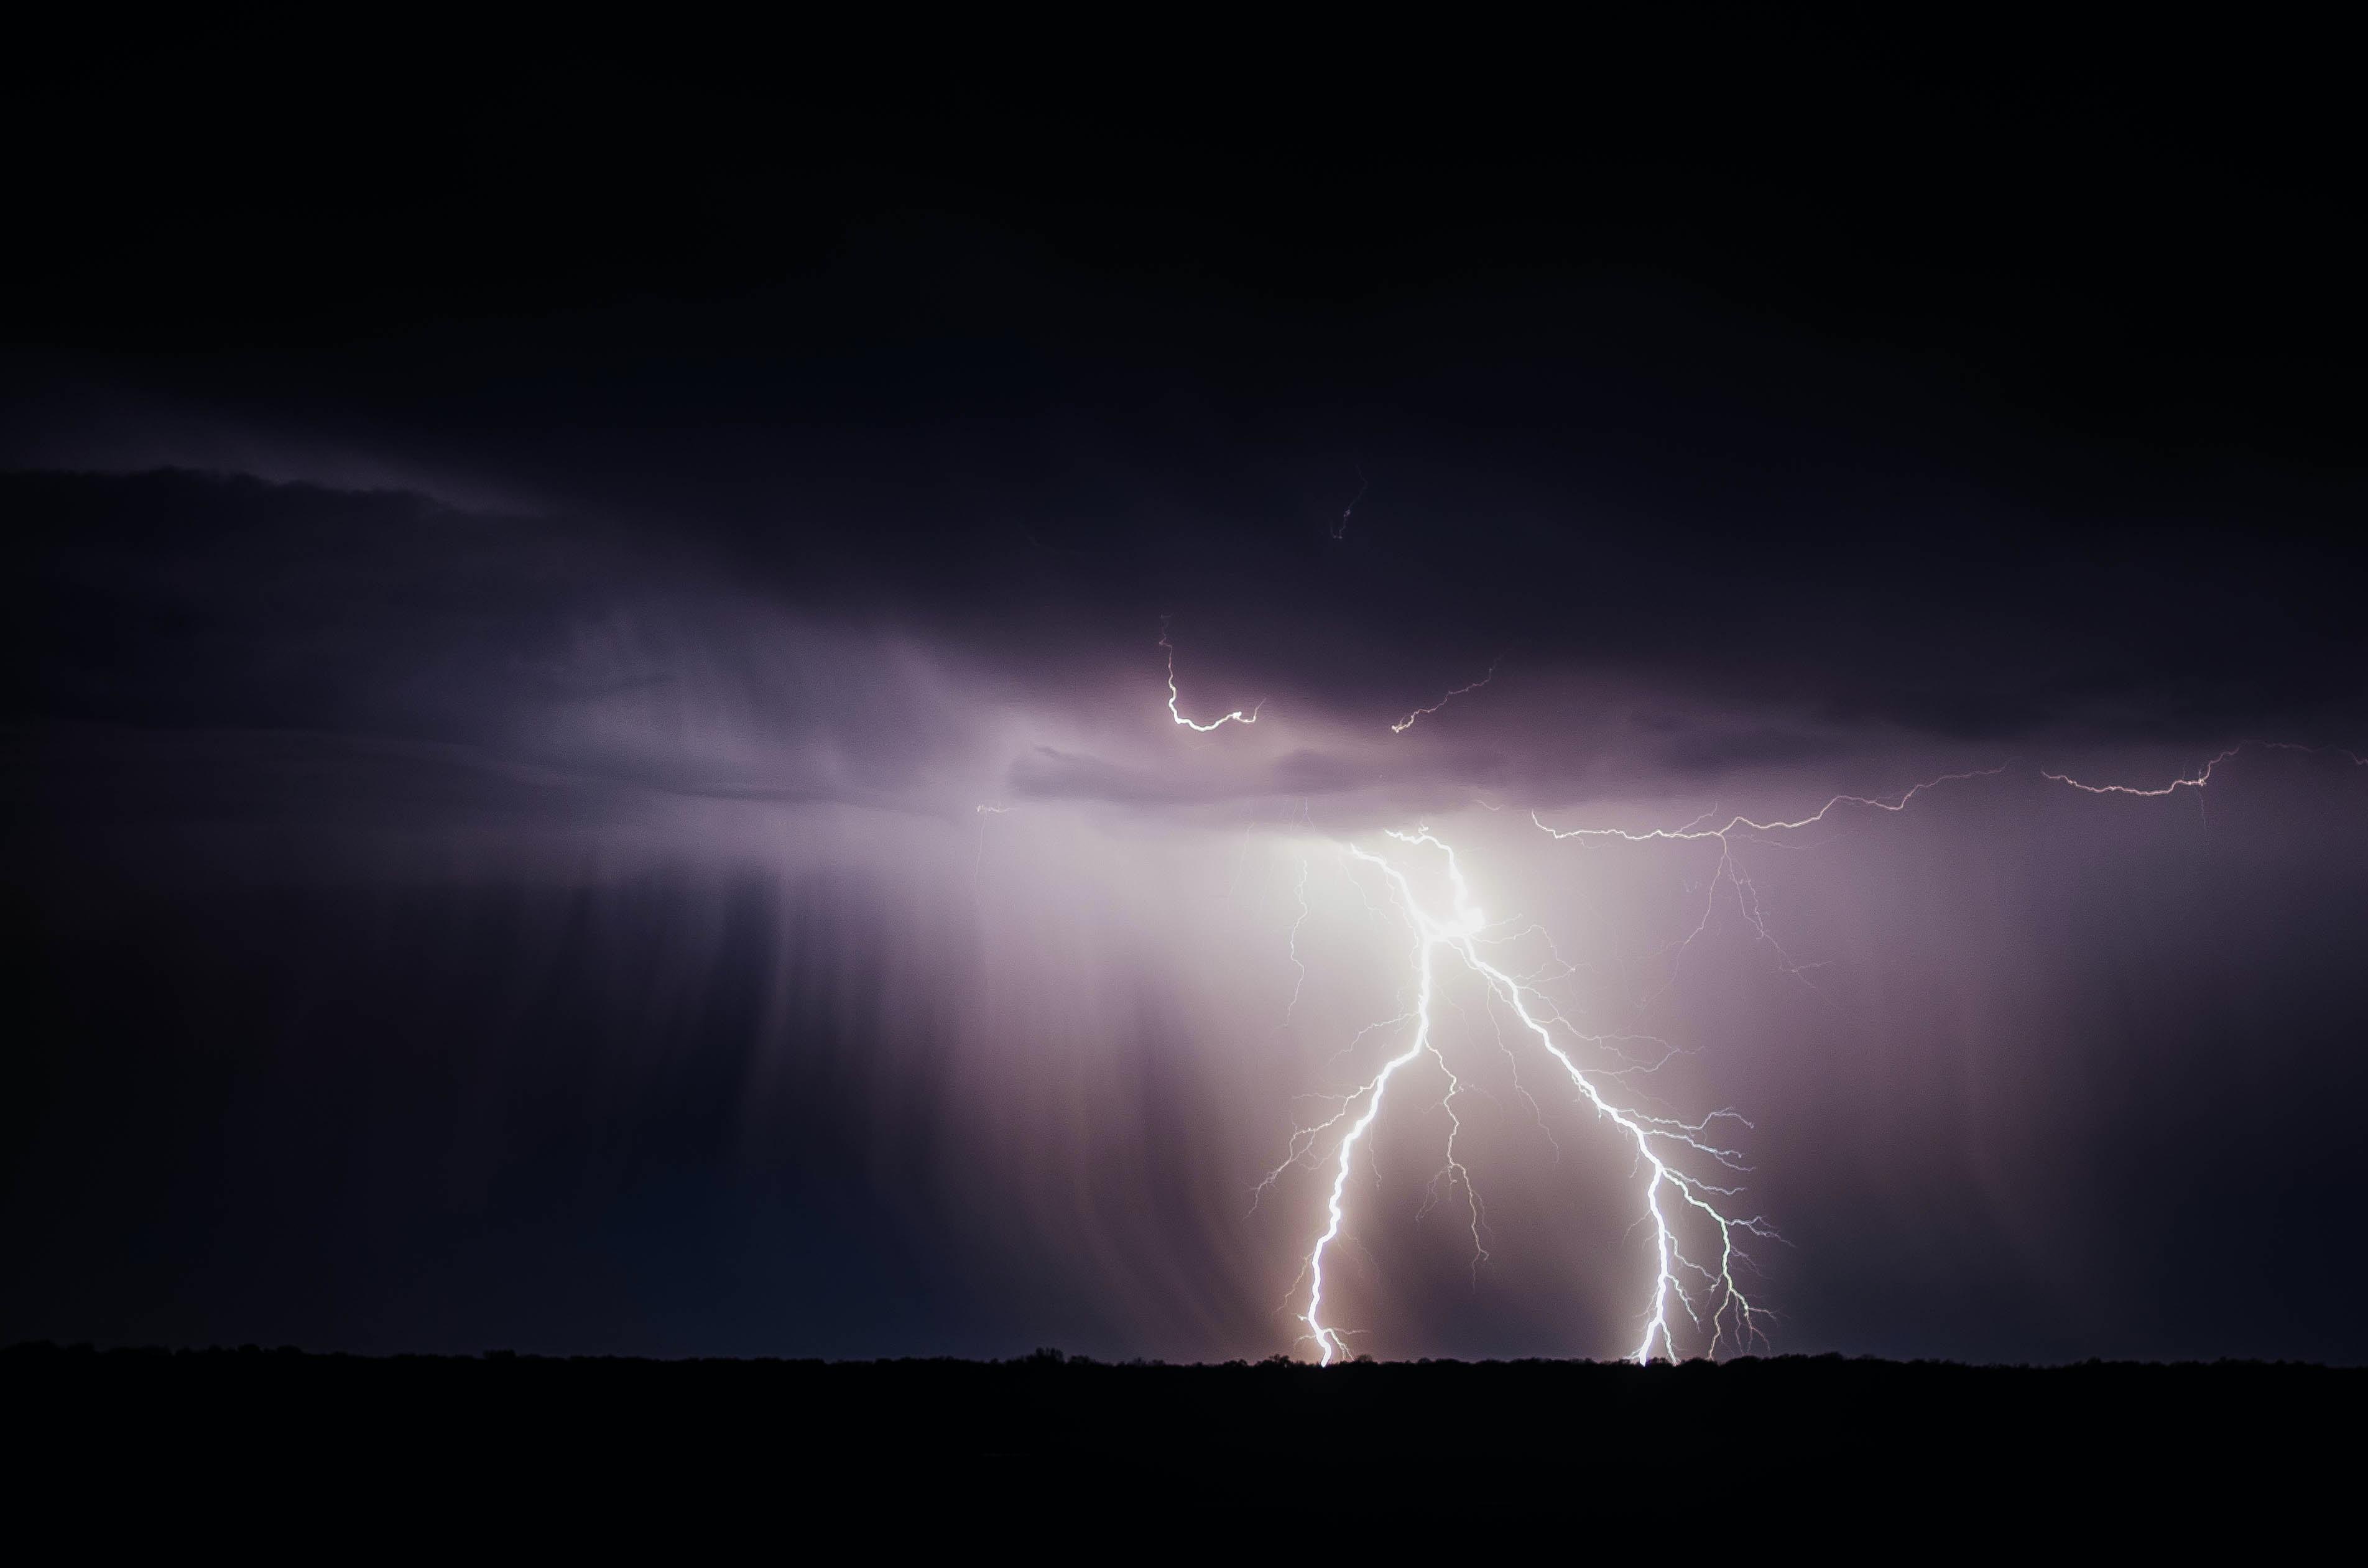 burza, czerń, literatura, Mickiewicz, Szekspir, magia, symbolika